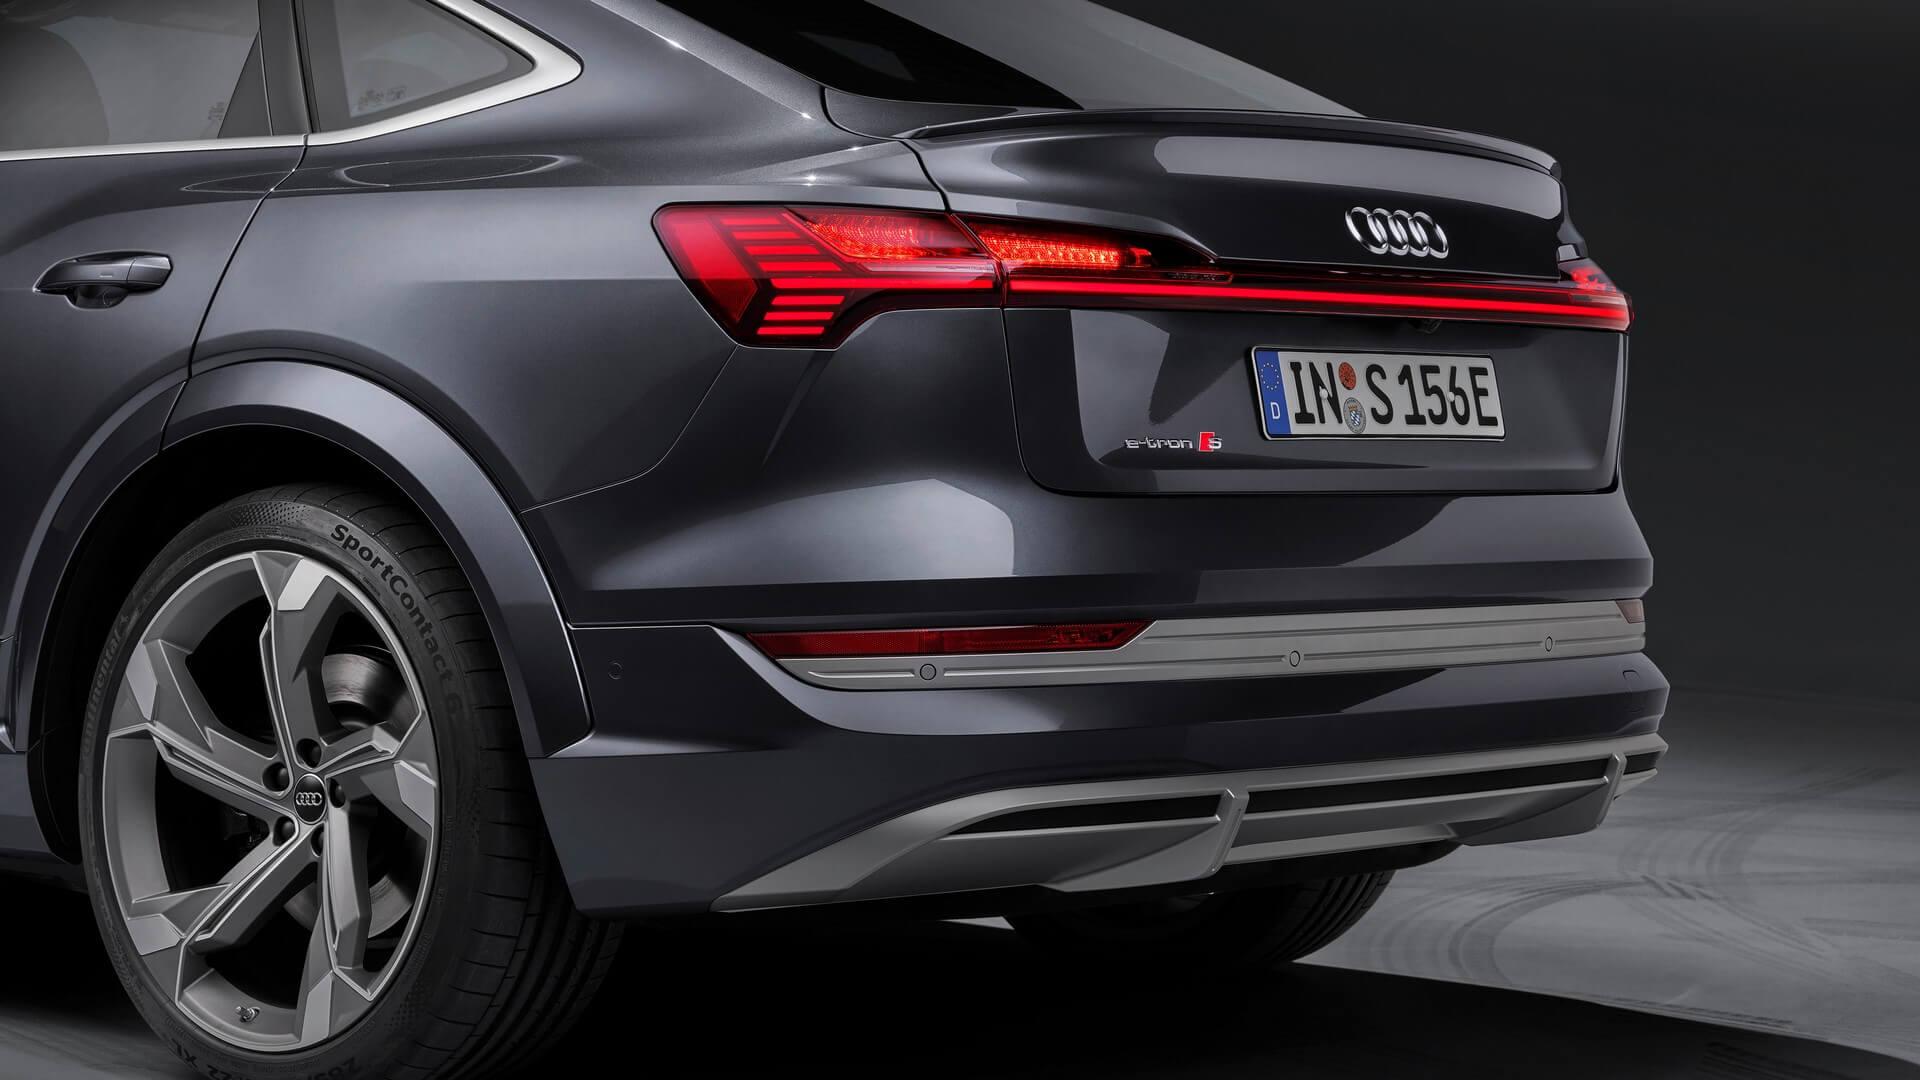 Audi-E-Tron-S-and-E-Tron-S-Sportback-2020-96